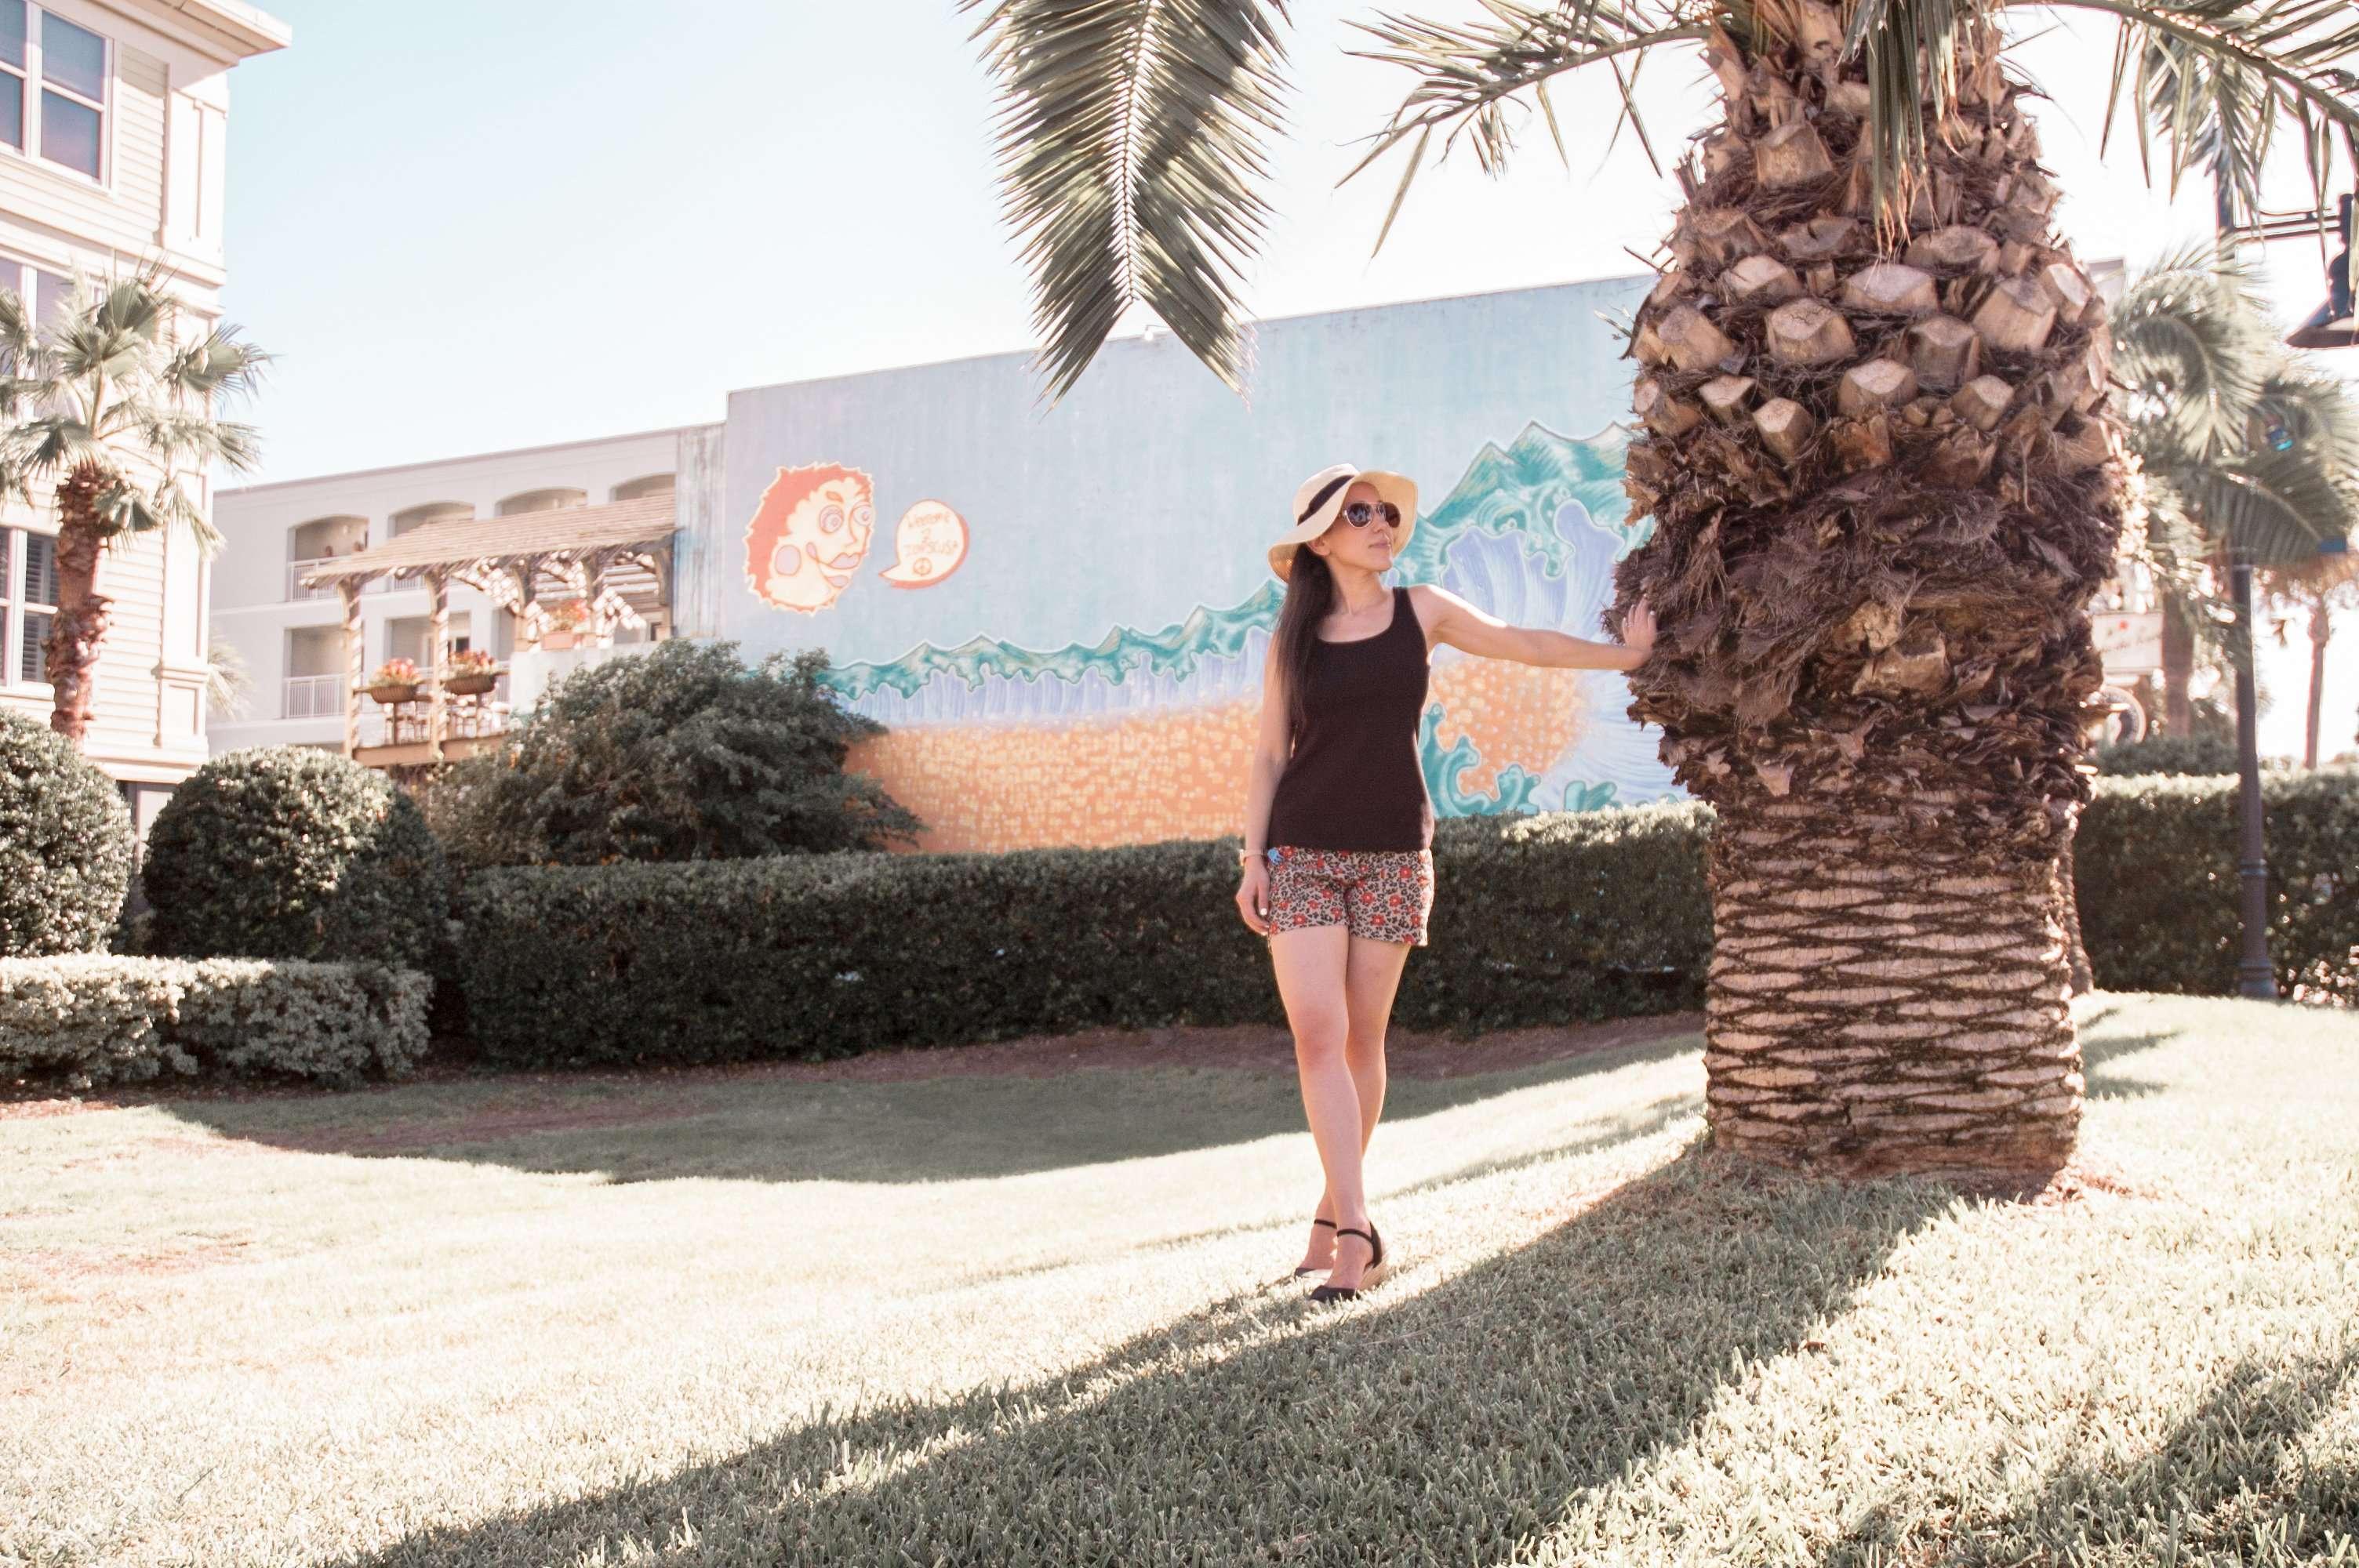 Isle of Palms Mural